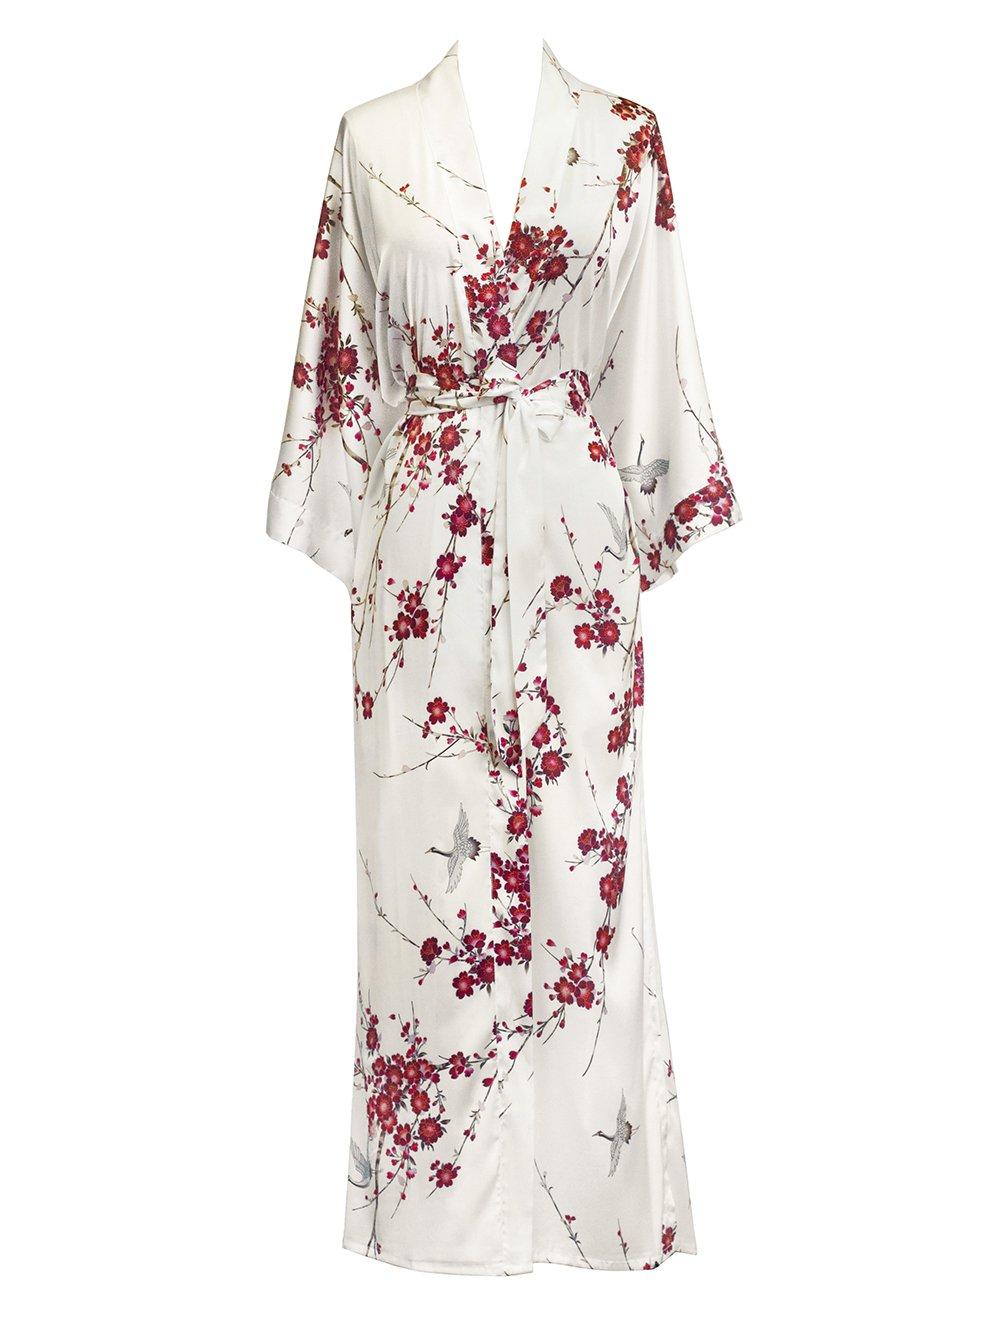 Old Shanghai Women's Kimono Robe Long - Watercolor Floral, Cherry Blossom & Crane- White